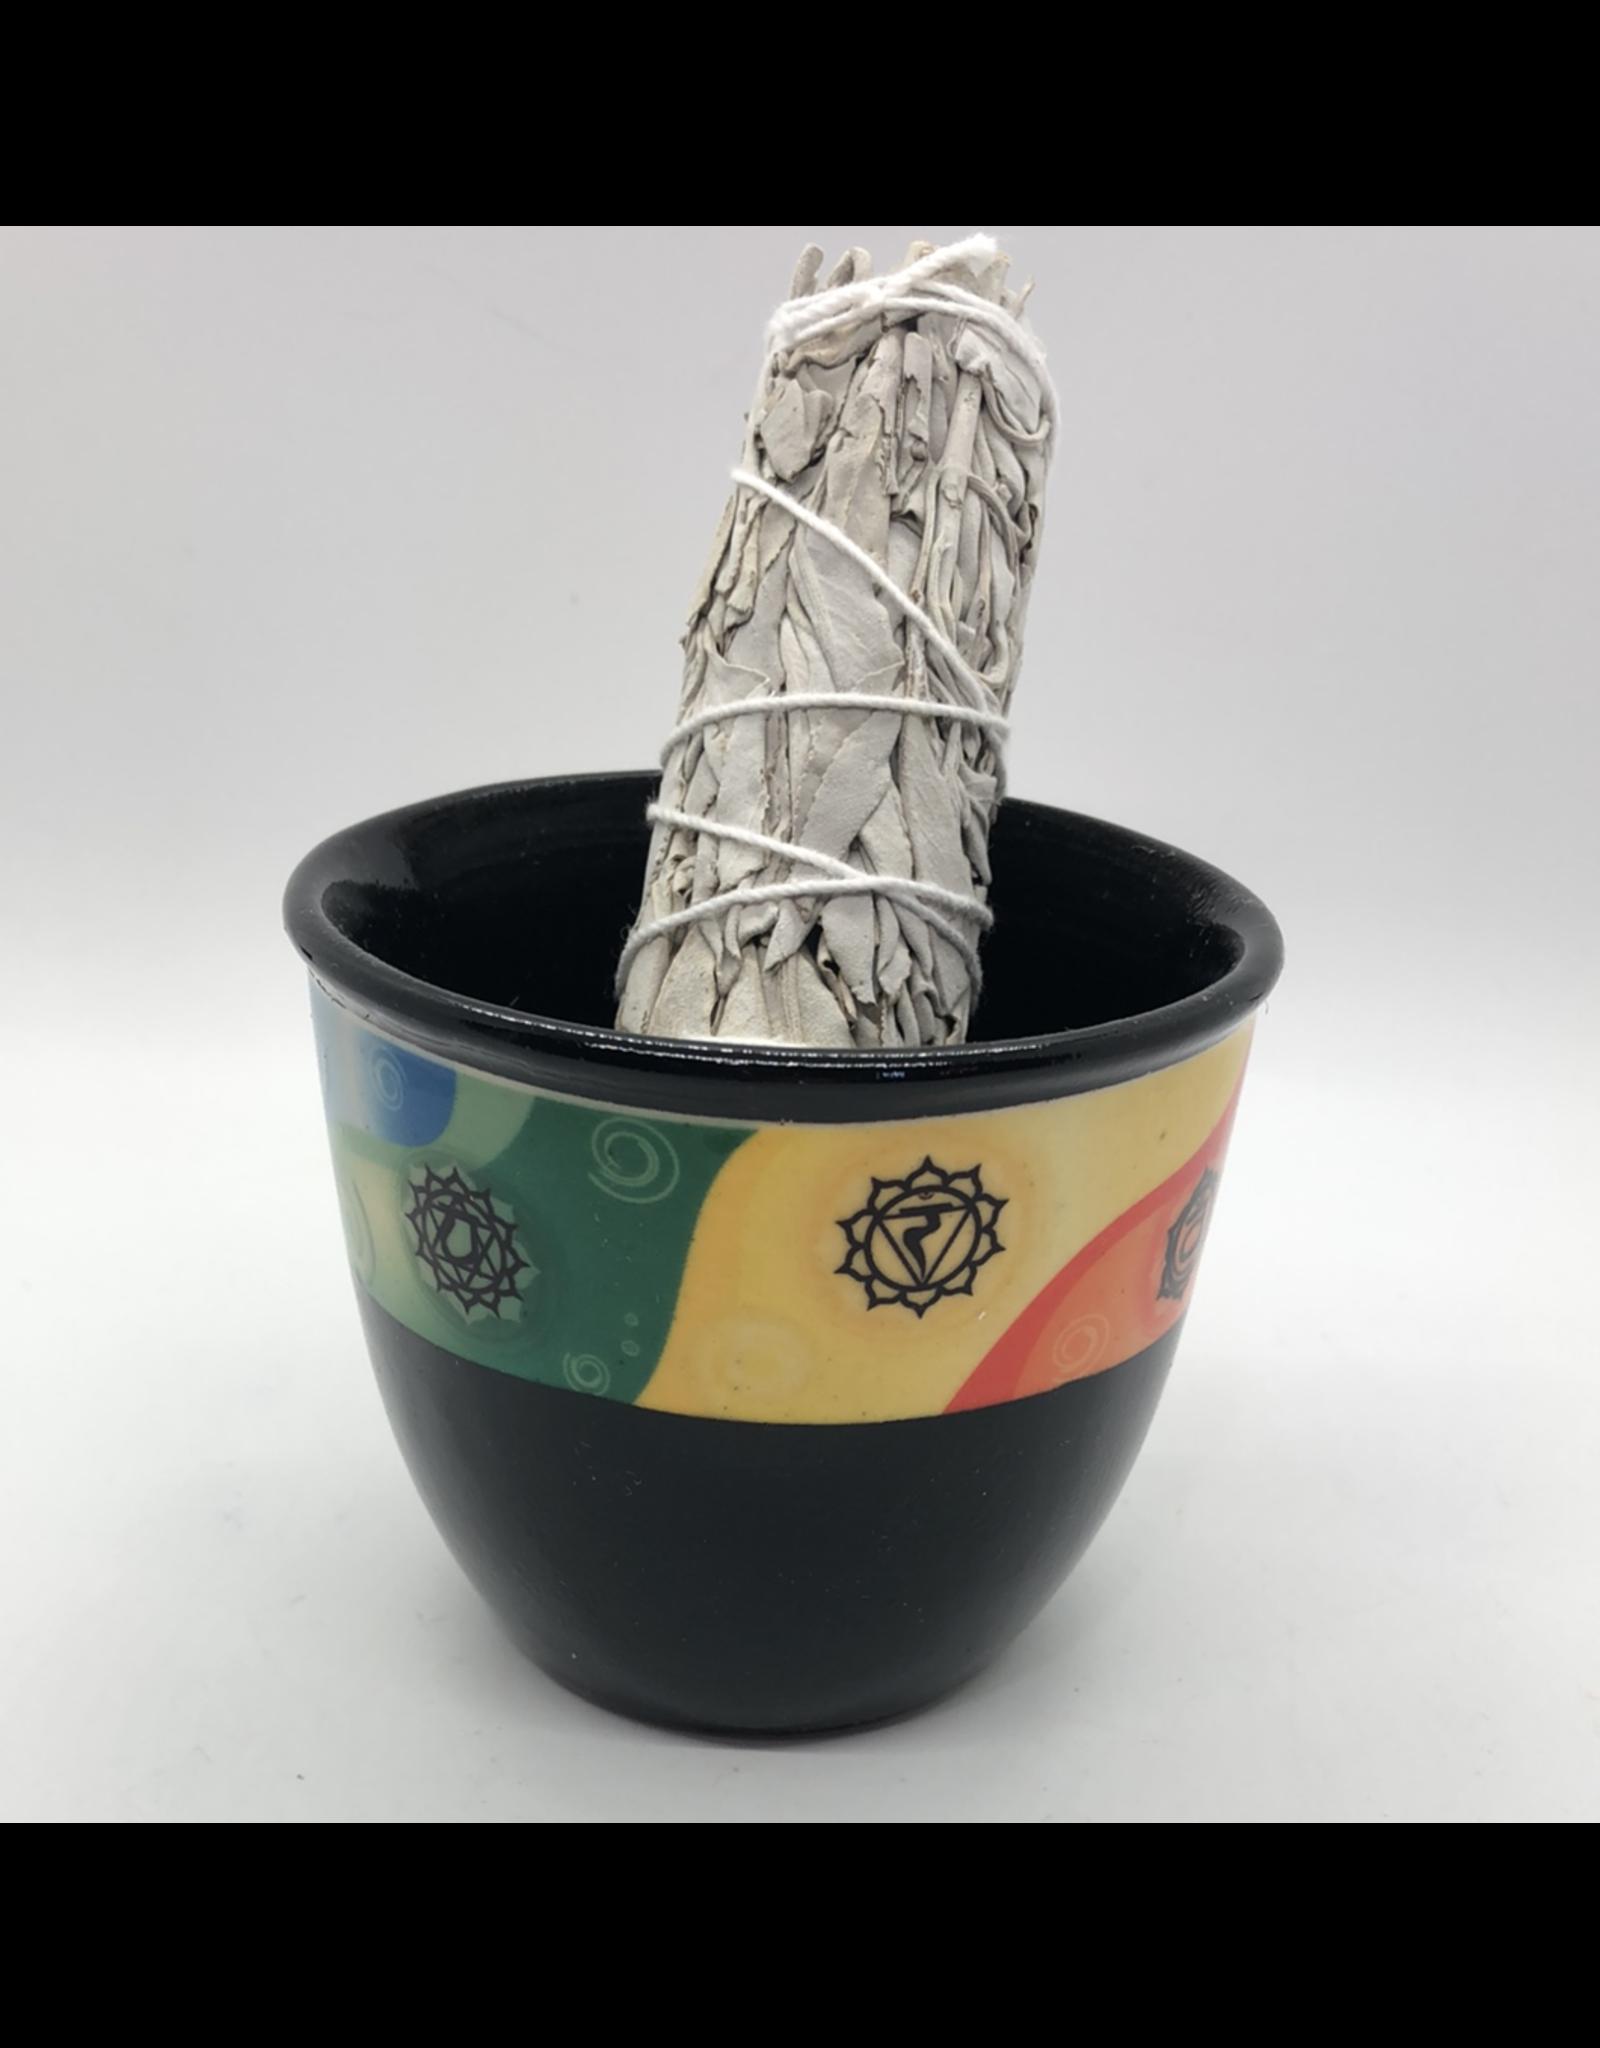 Small Ceramic Smudge Pot - Chakras